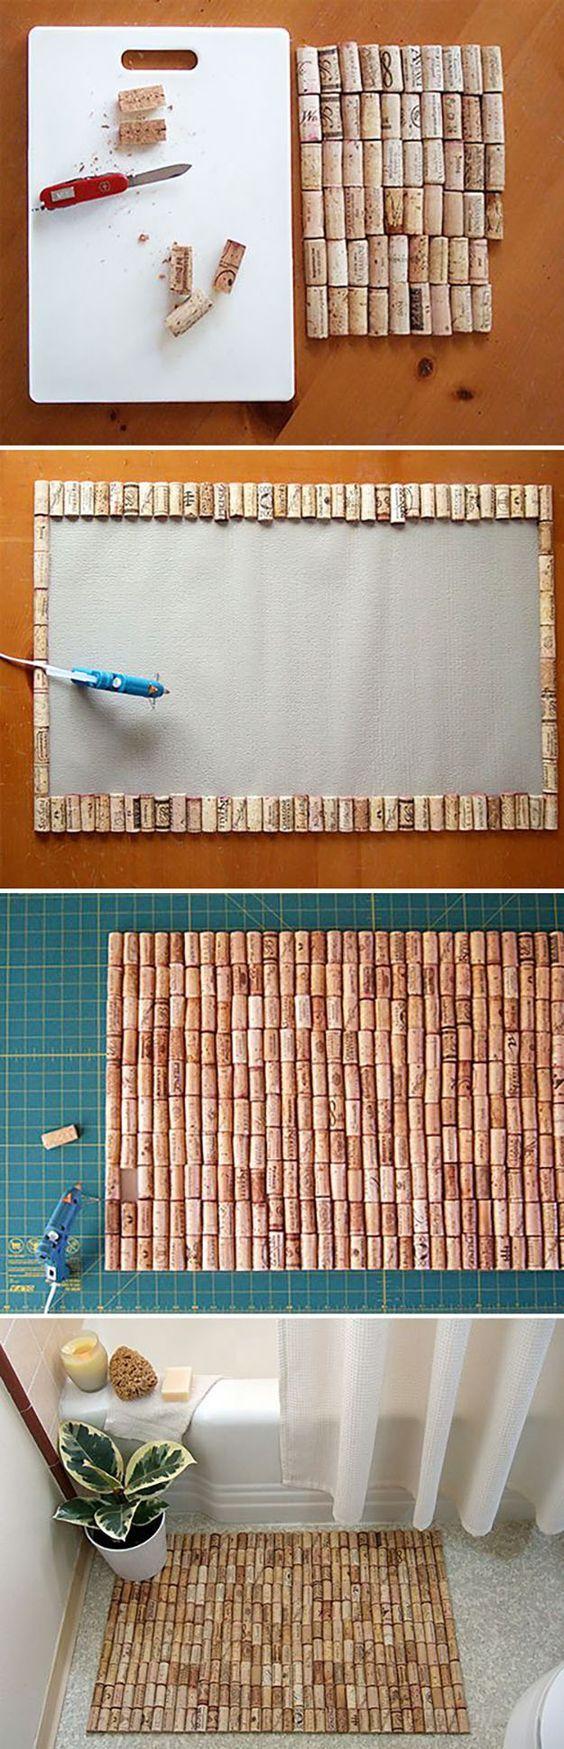 Easy Wine Cork Craft Ideas for the Home – DIY Wine Cork Bathmat – DIY Projects